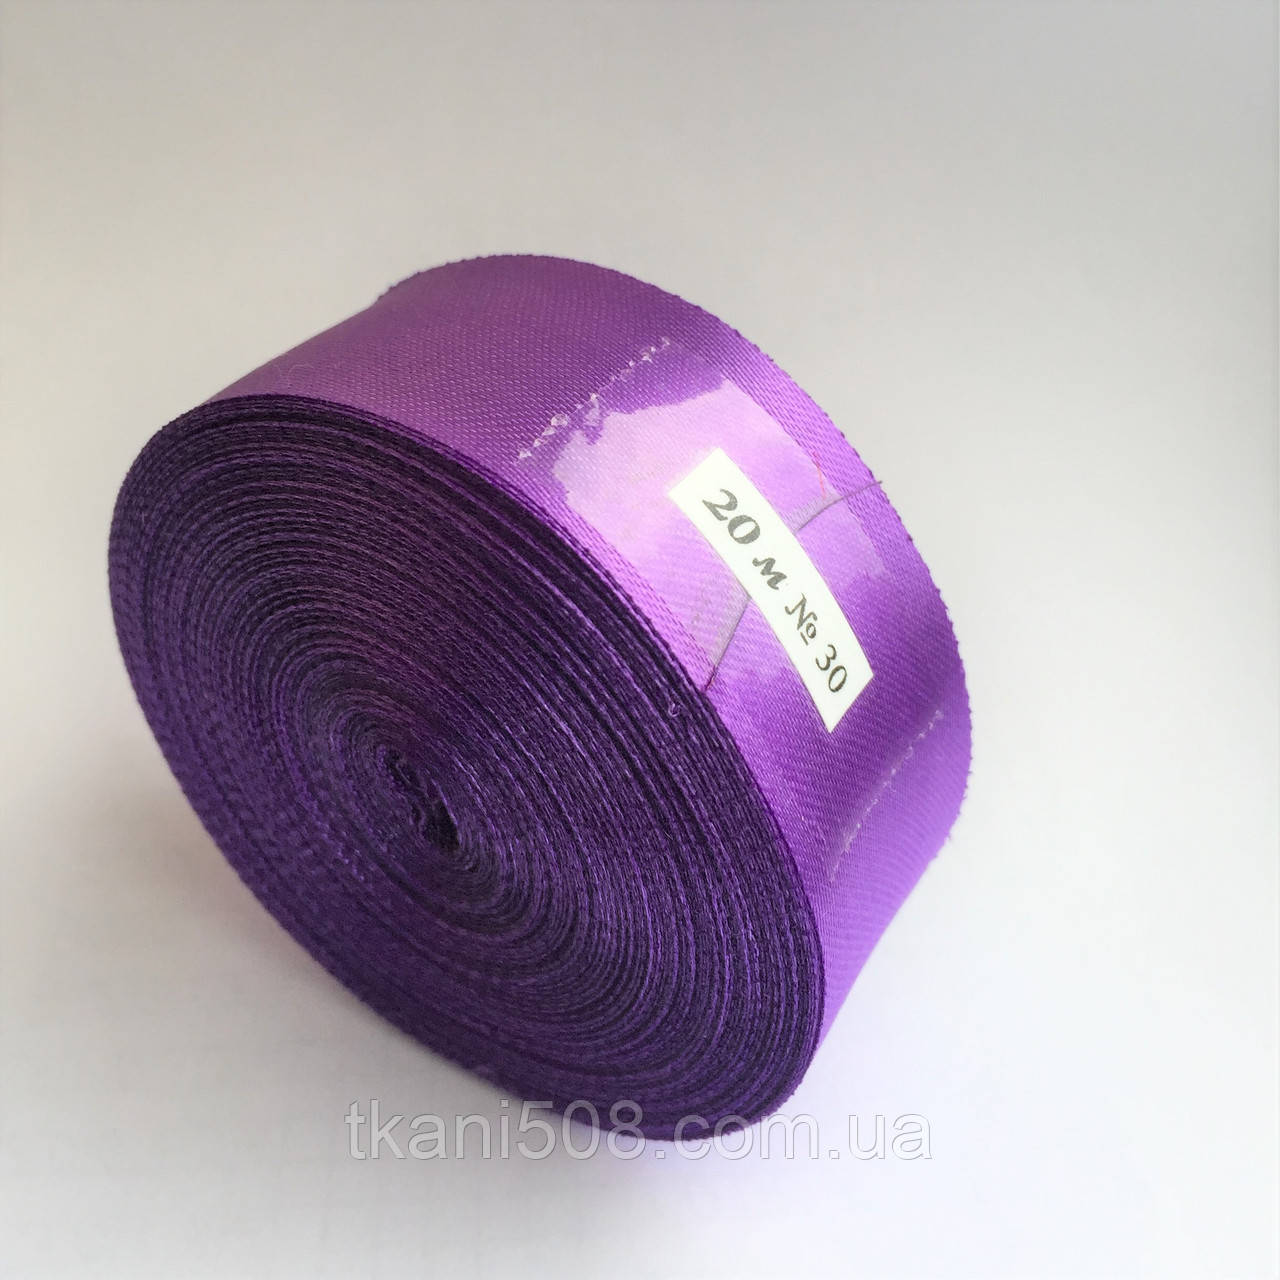 Атласная лента 5 см - цвет фиолетовый 30